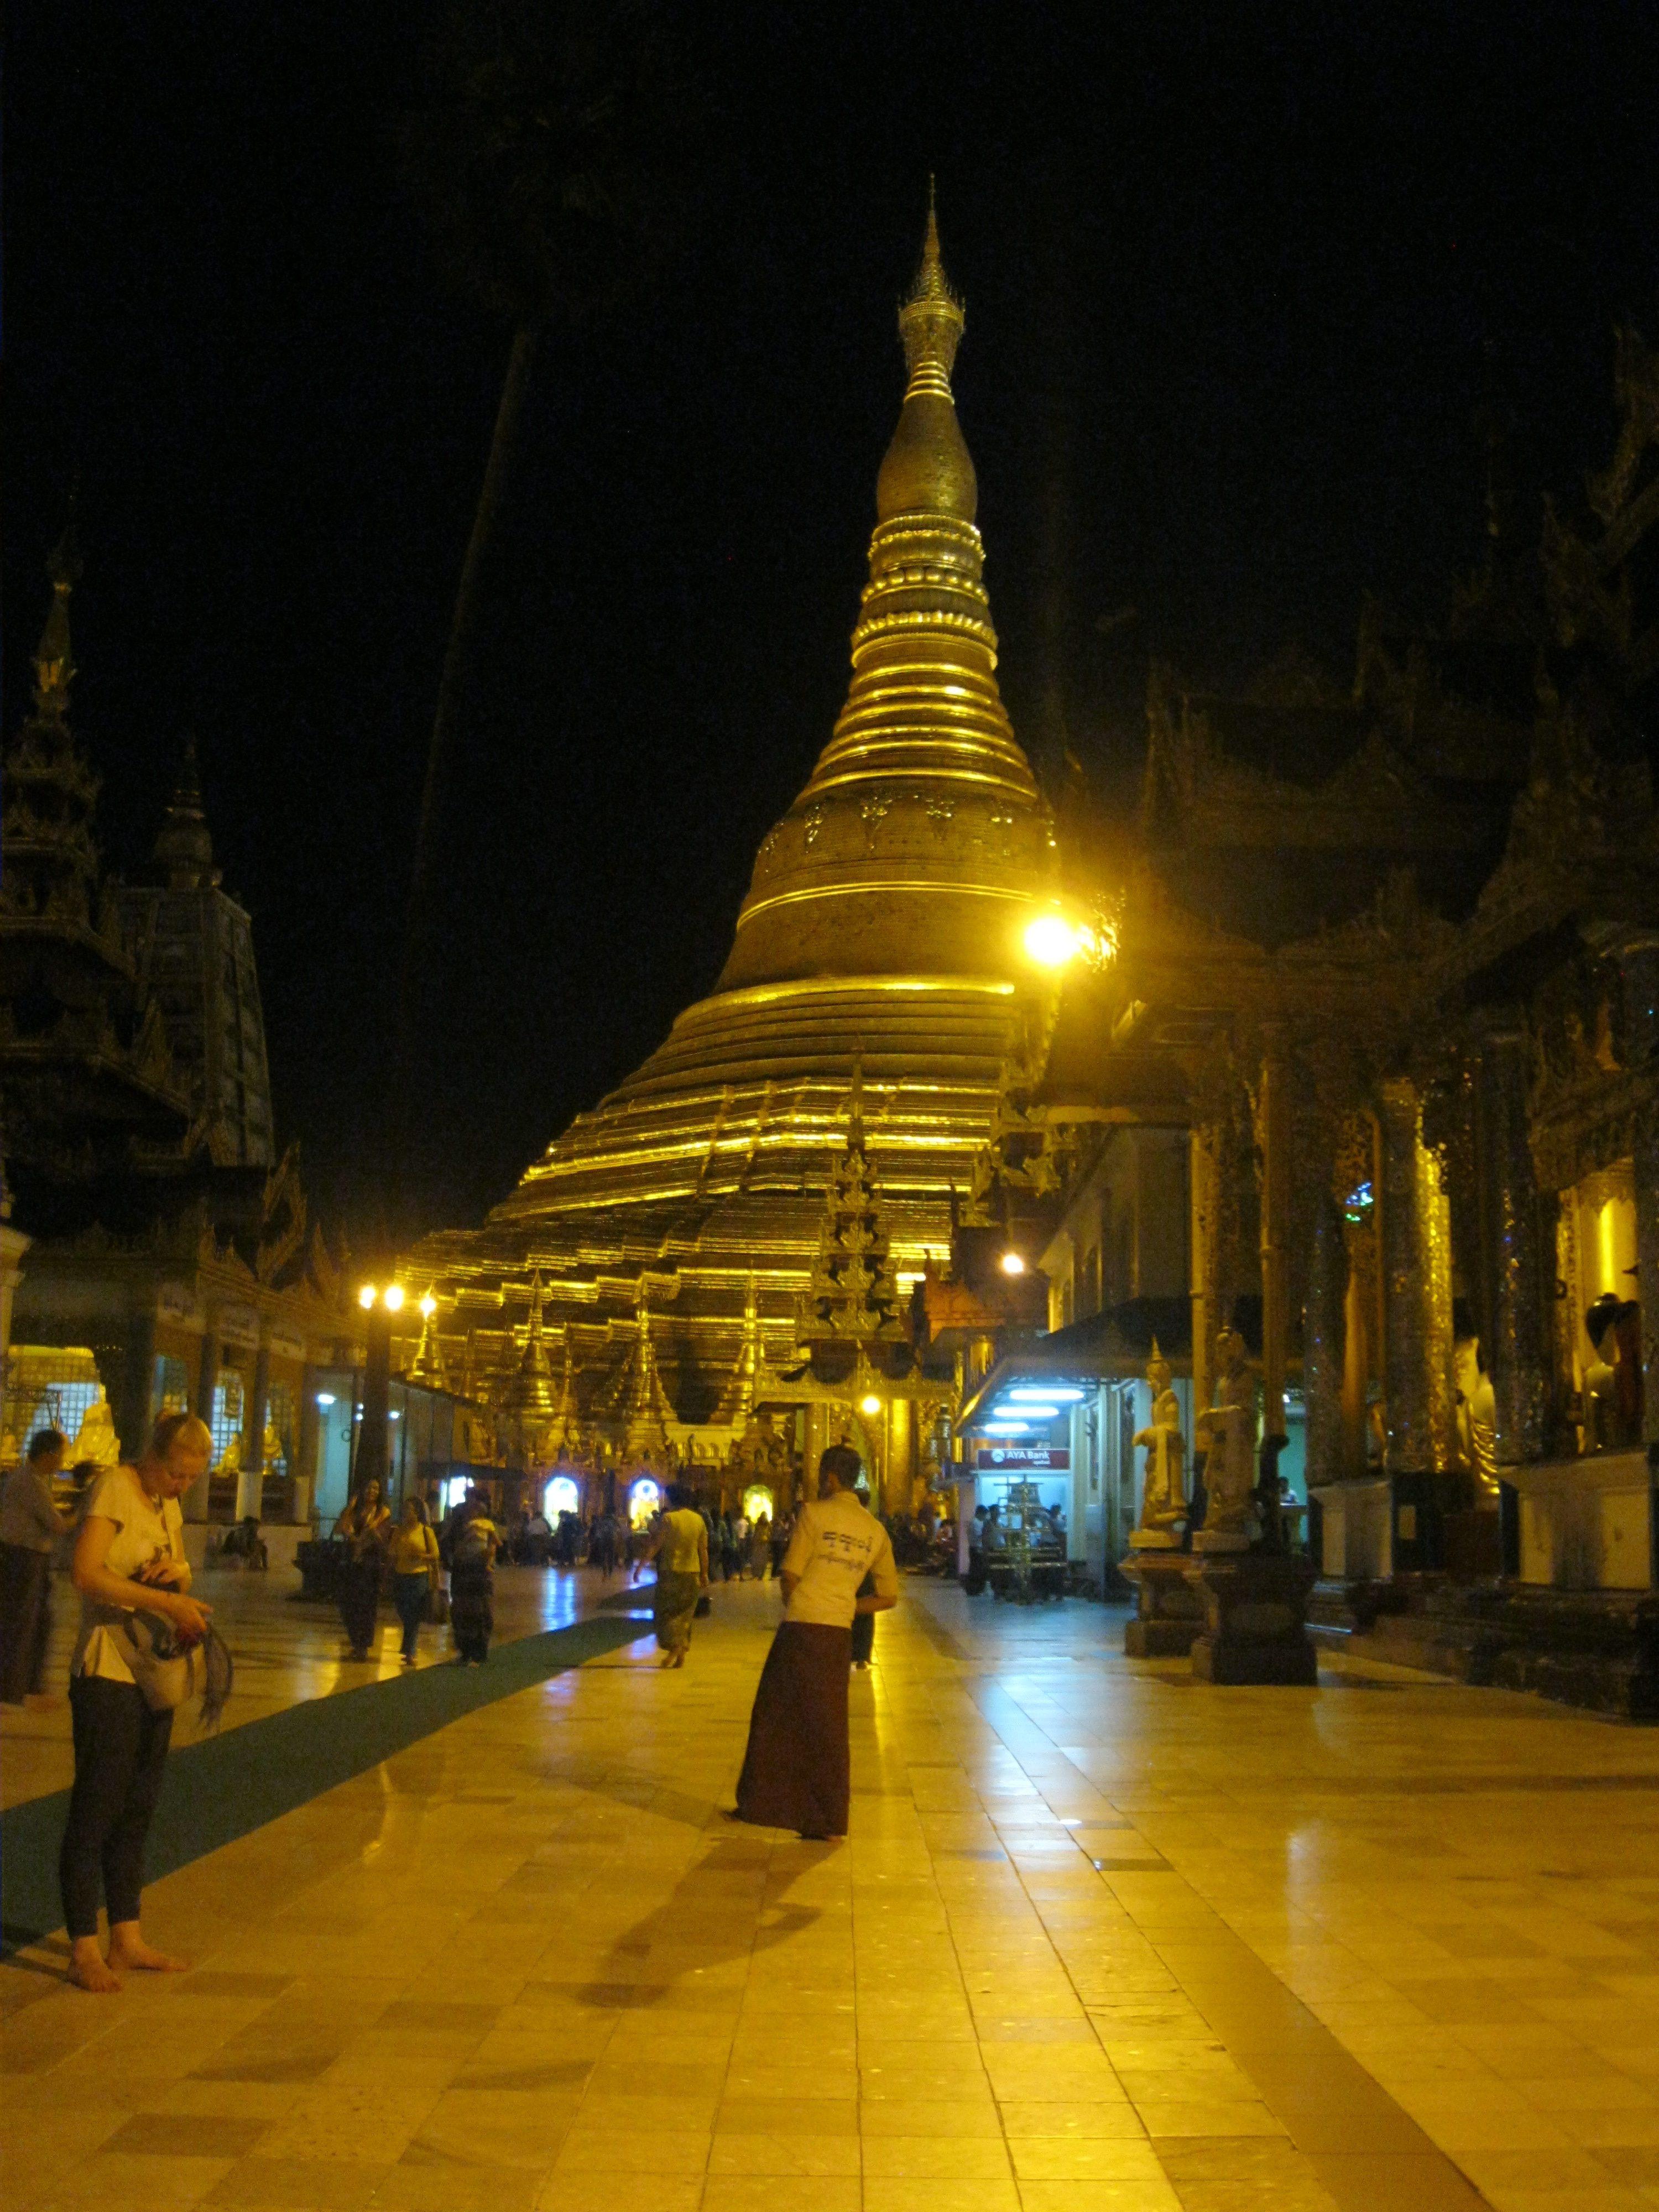 Myanmar, Schwedagon Pagoda, adventure, teach abroad